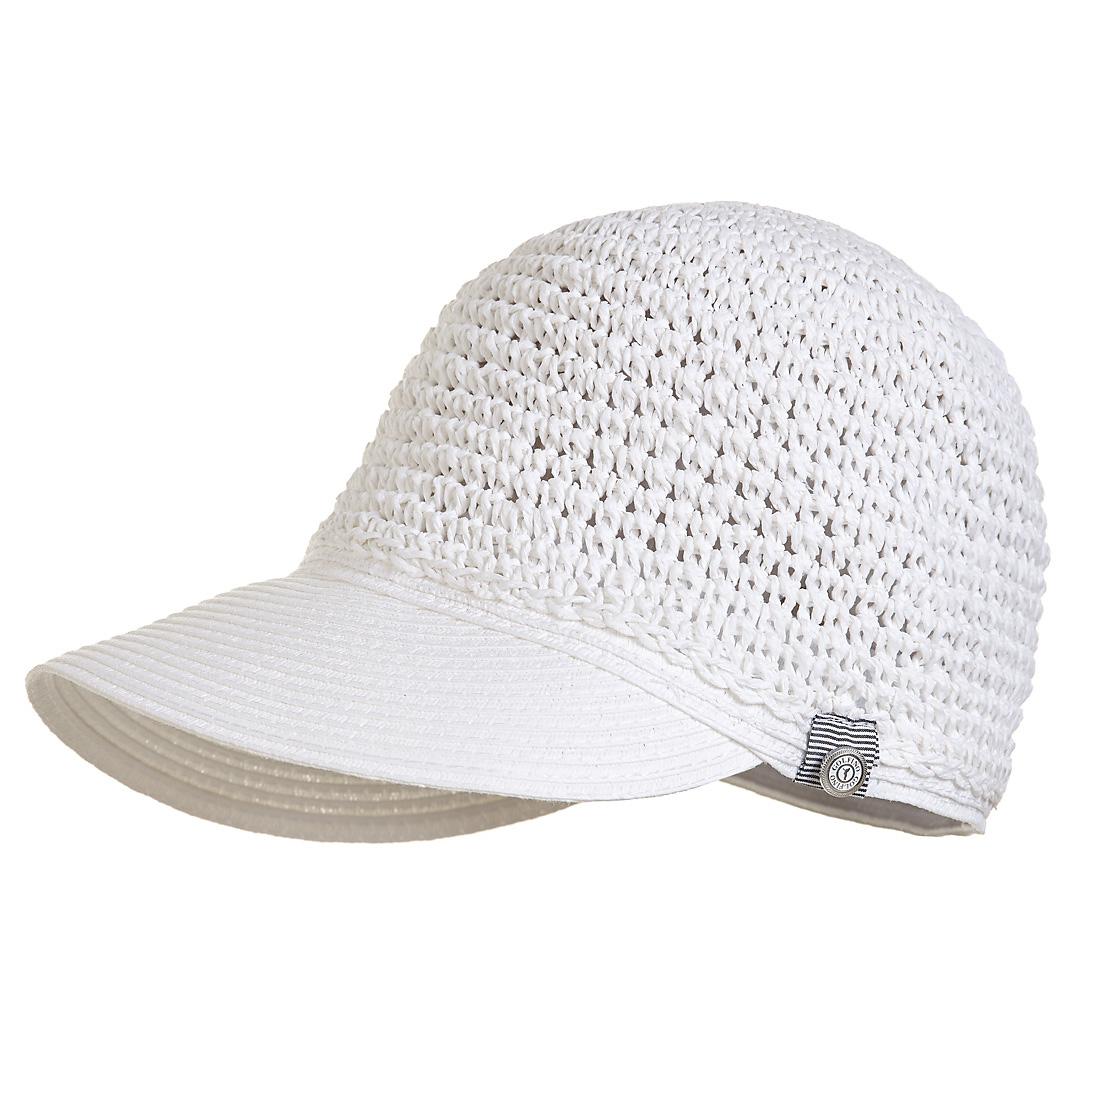 Damen Golfhut aus geflochtenem Papier